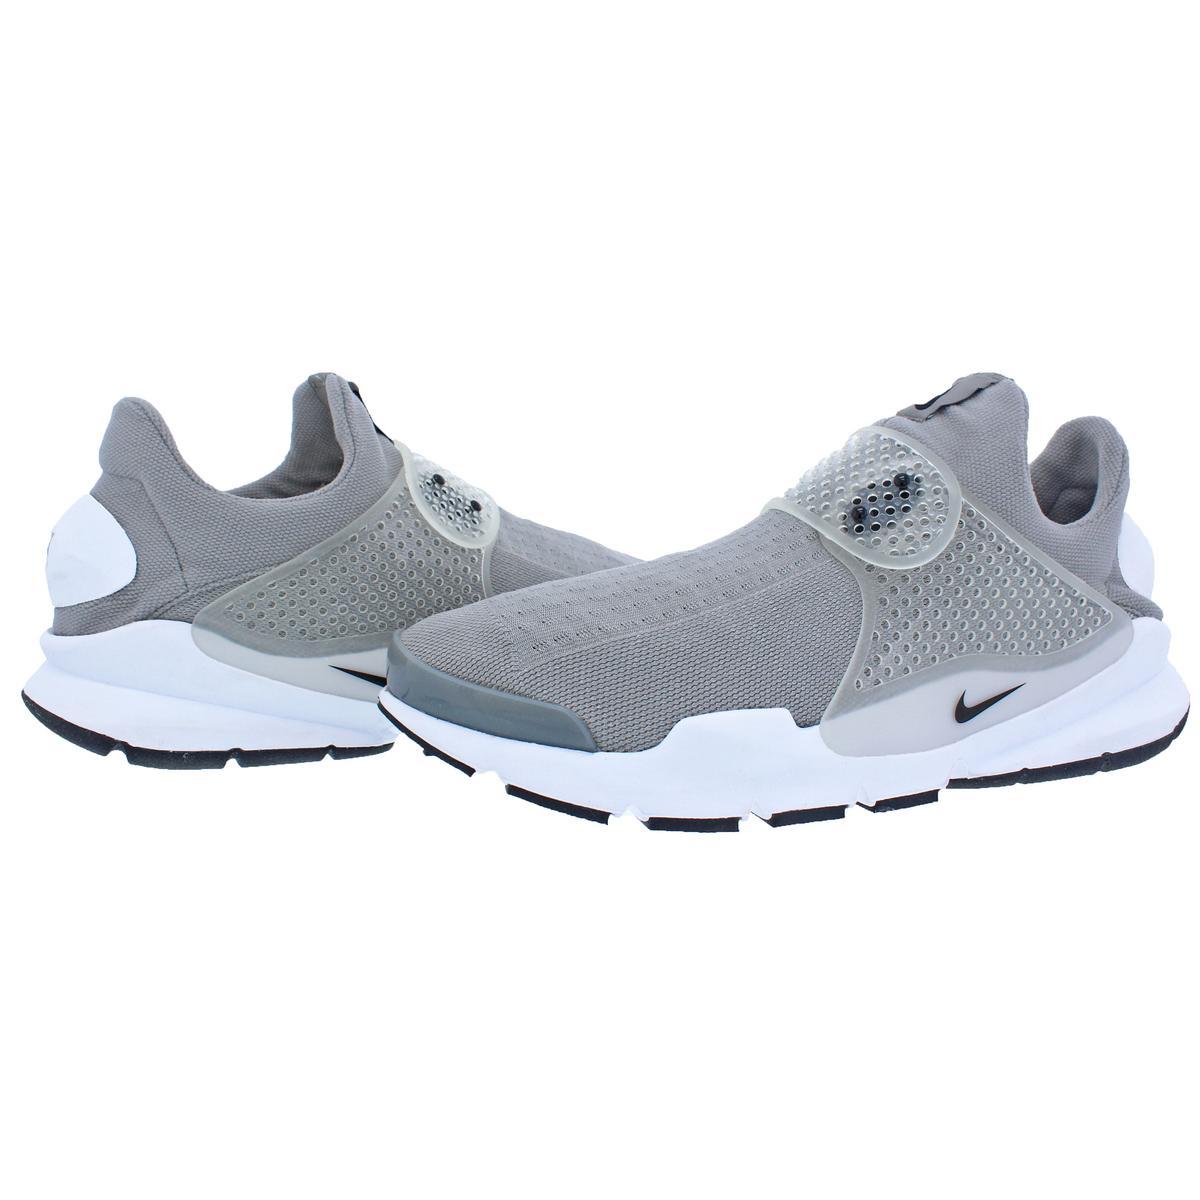 Nike Mens Sock Dart KJCRD Lightweight Knit Running BHFO Shoes Sneakers BHFO Running 5818 Medium Grey/Black/White aee7fc